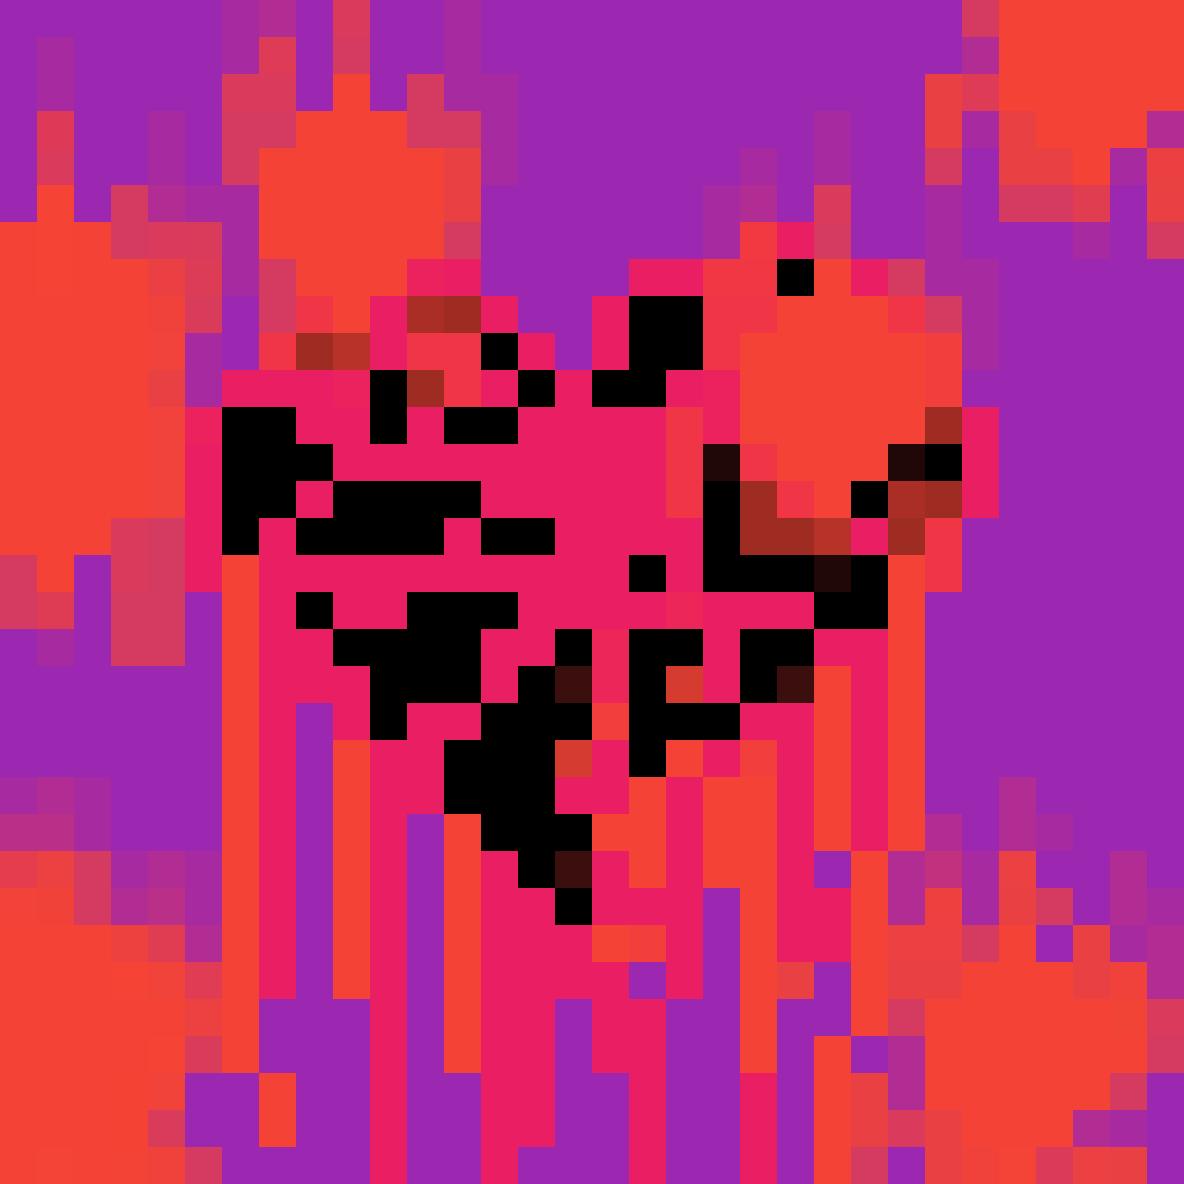 Iz a heart. Cuz. I draw hearts when I'm bored.  by Kawichu